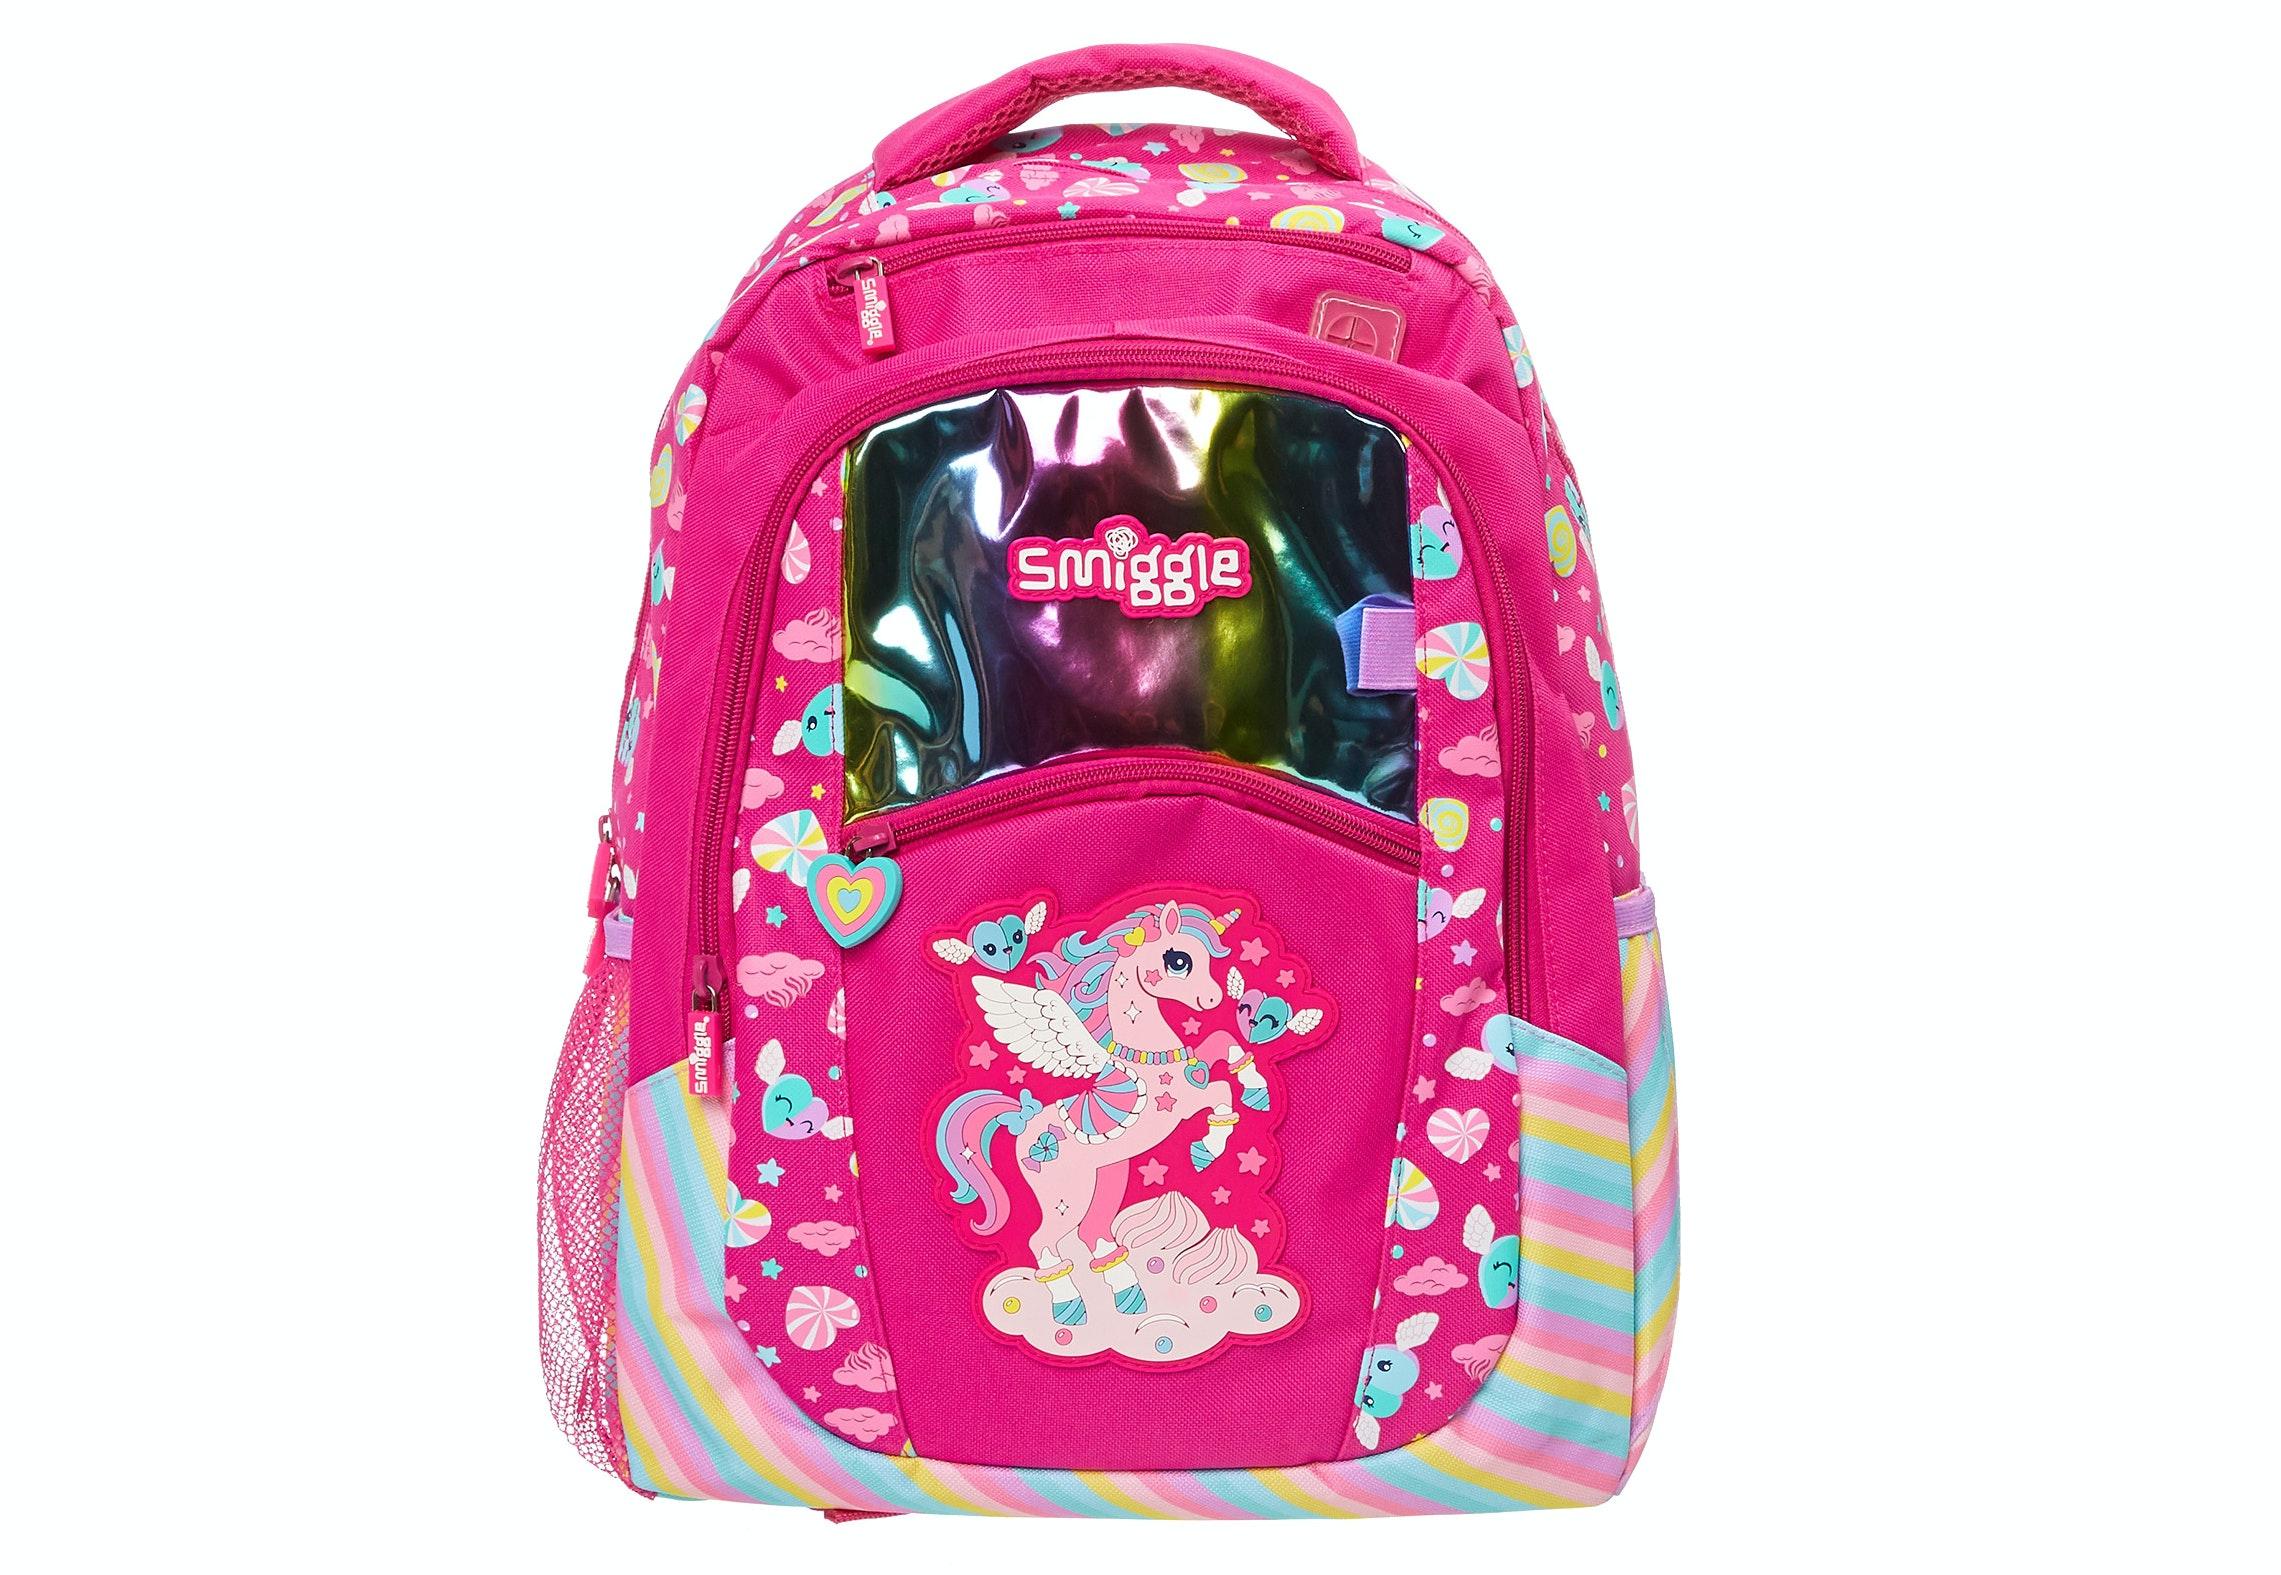 Smiggle Universe Backpack sweepstakes